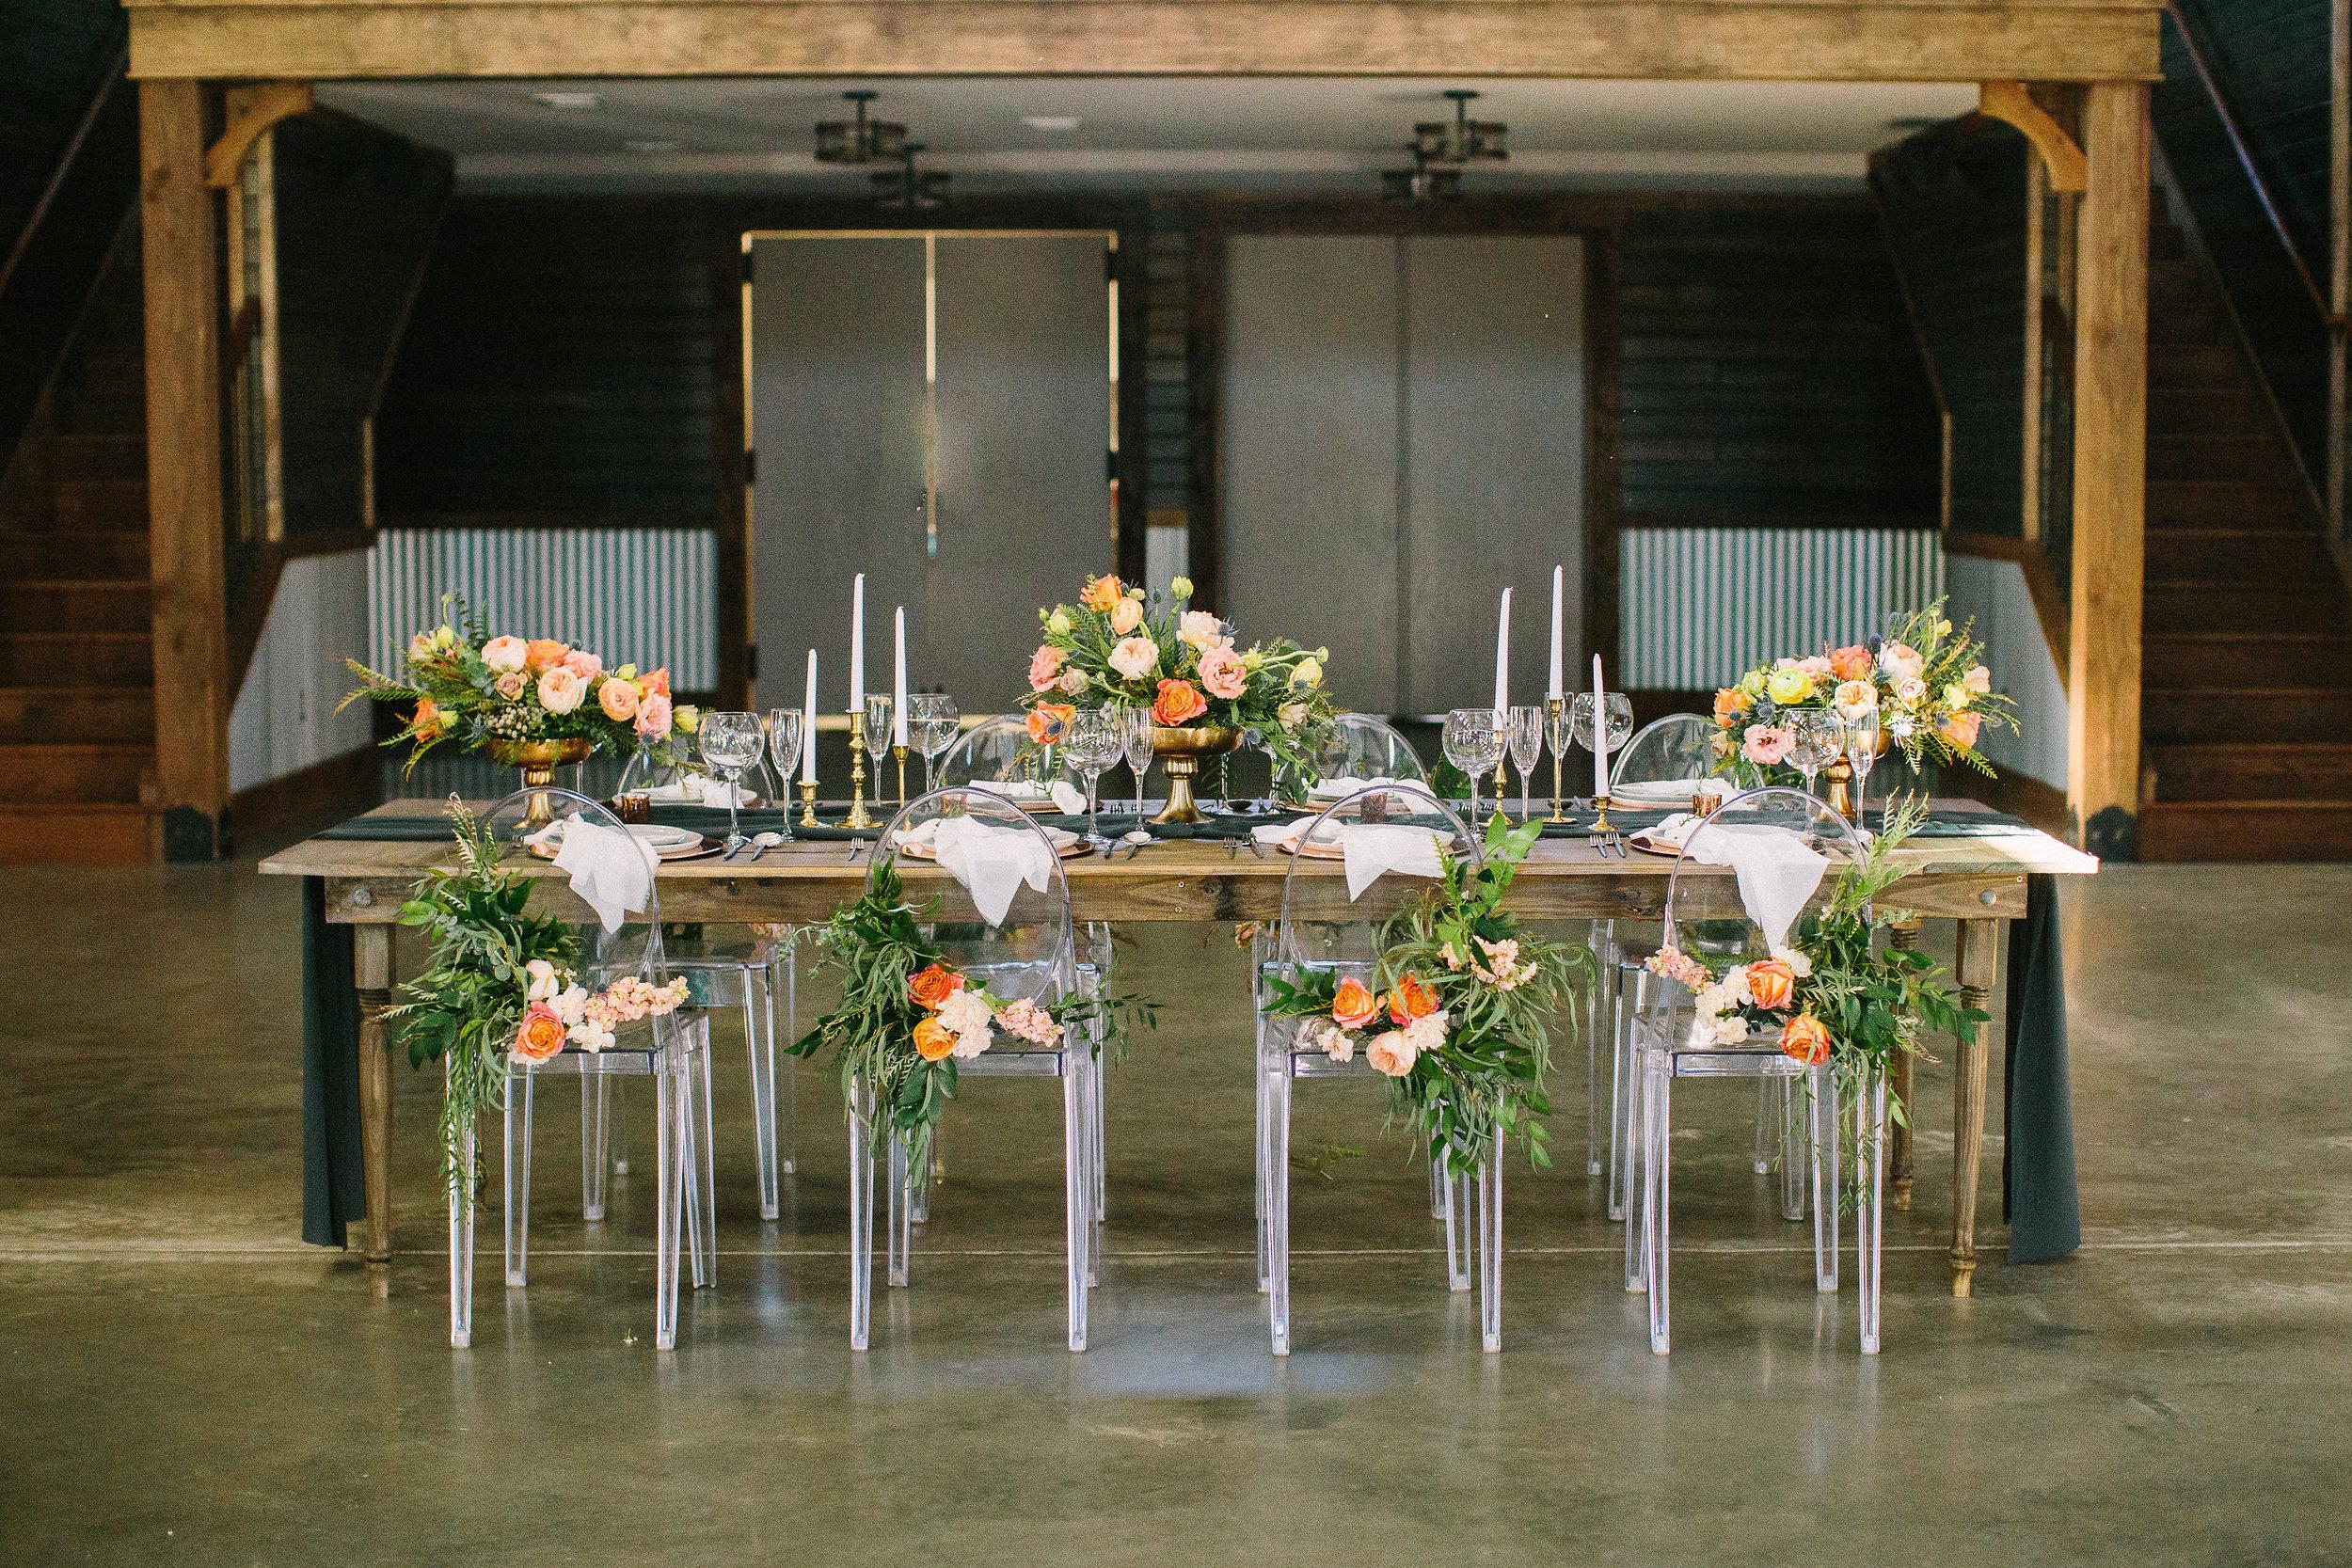 Ellen-Ashton-Photography-Peach-Creek-Ranch-Weddings-Wed-and-Prosper103.jpg